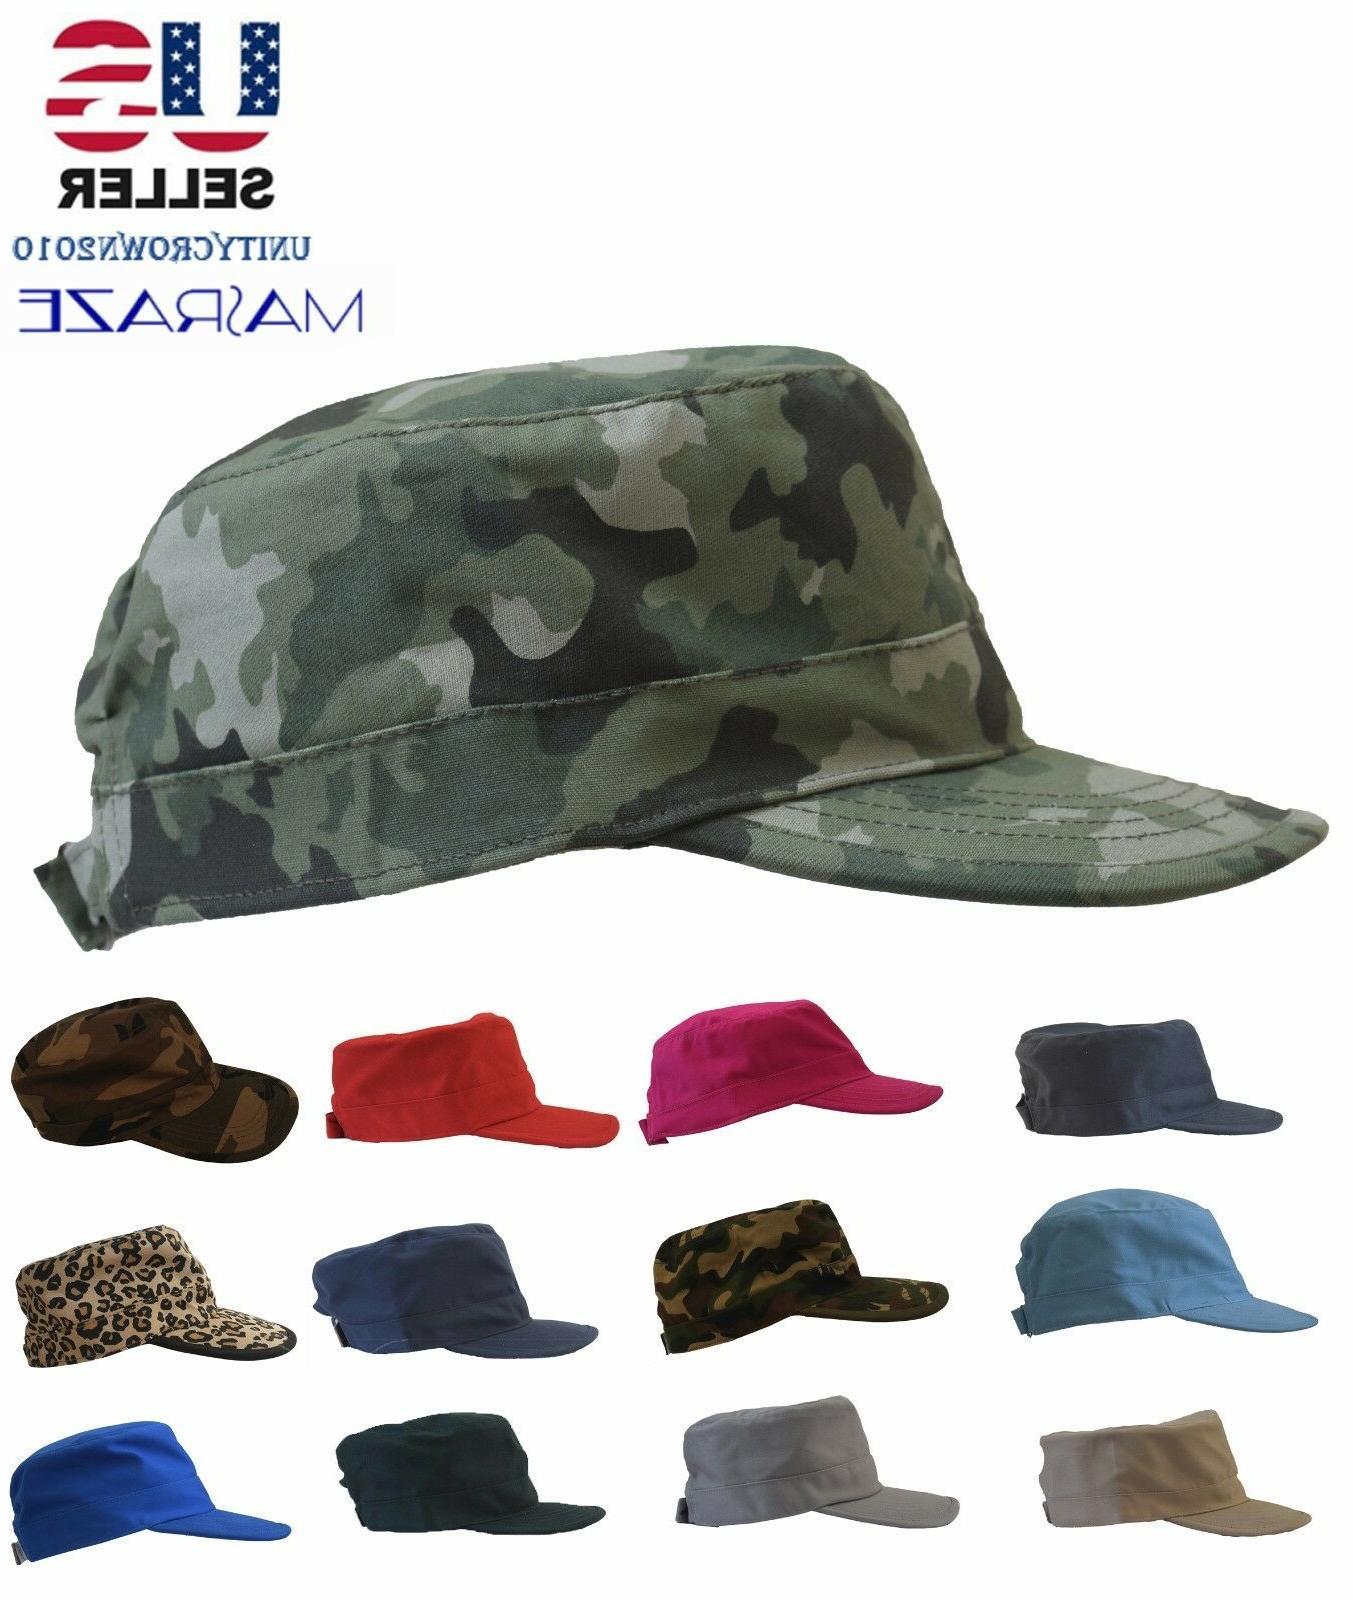 Masraze Army Military Cadet Men/Women Cotton